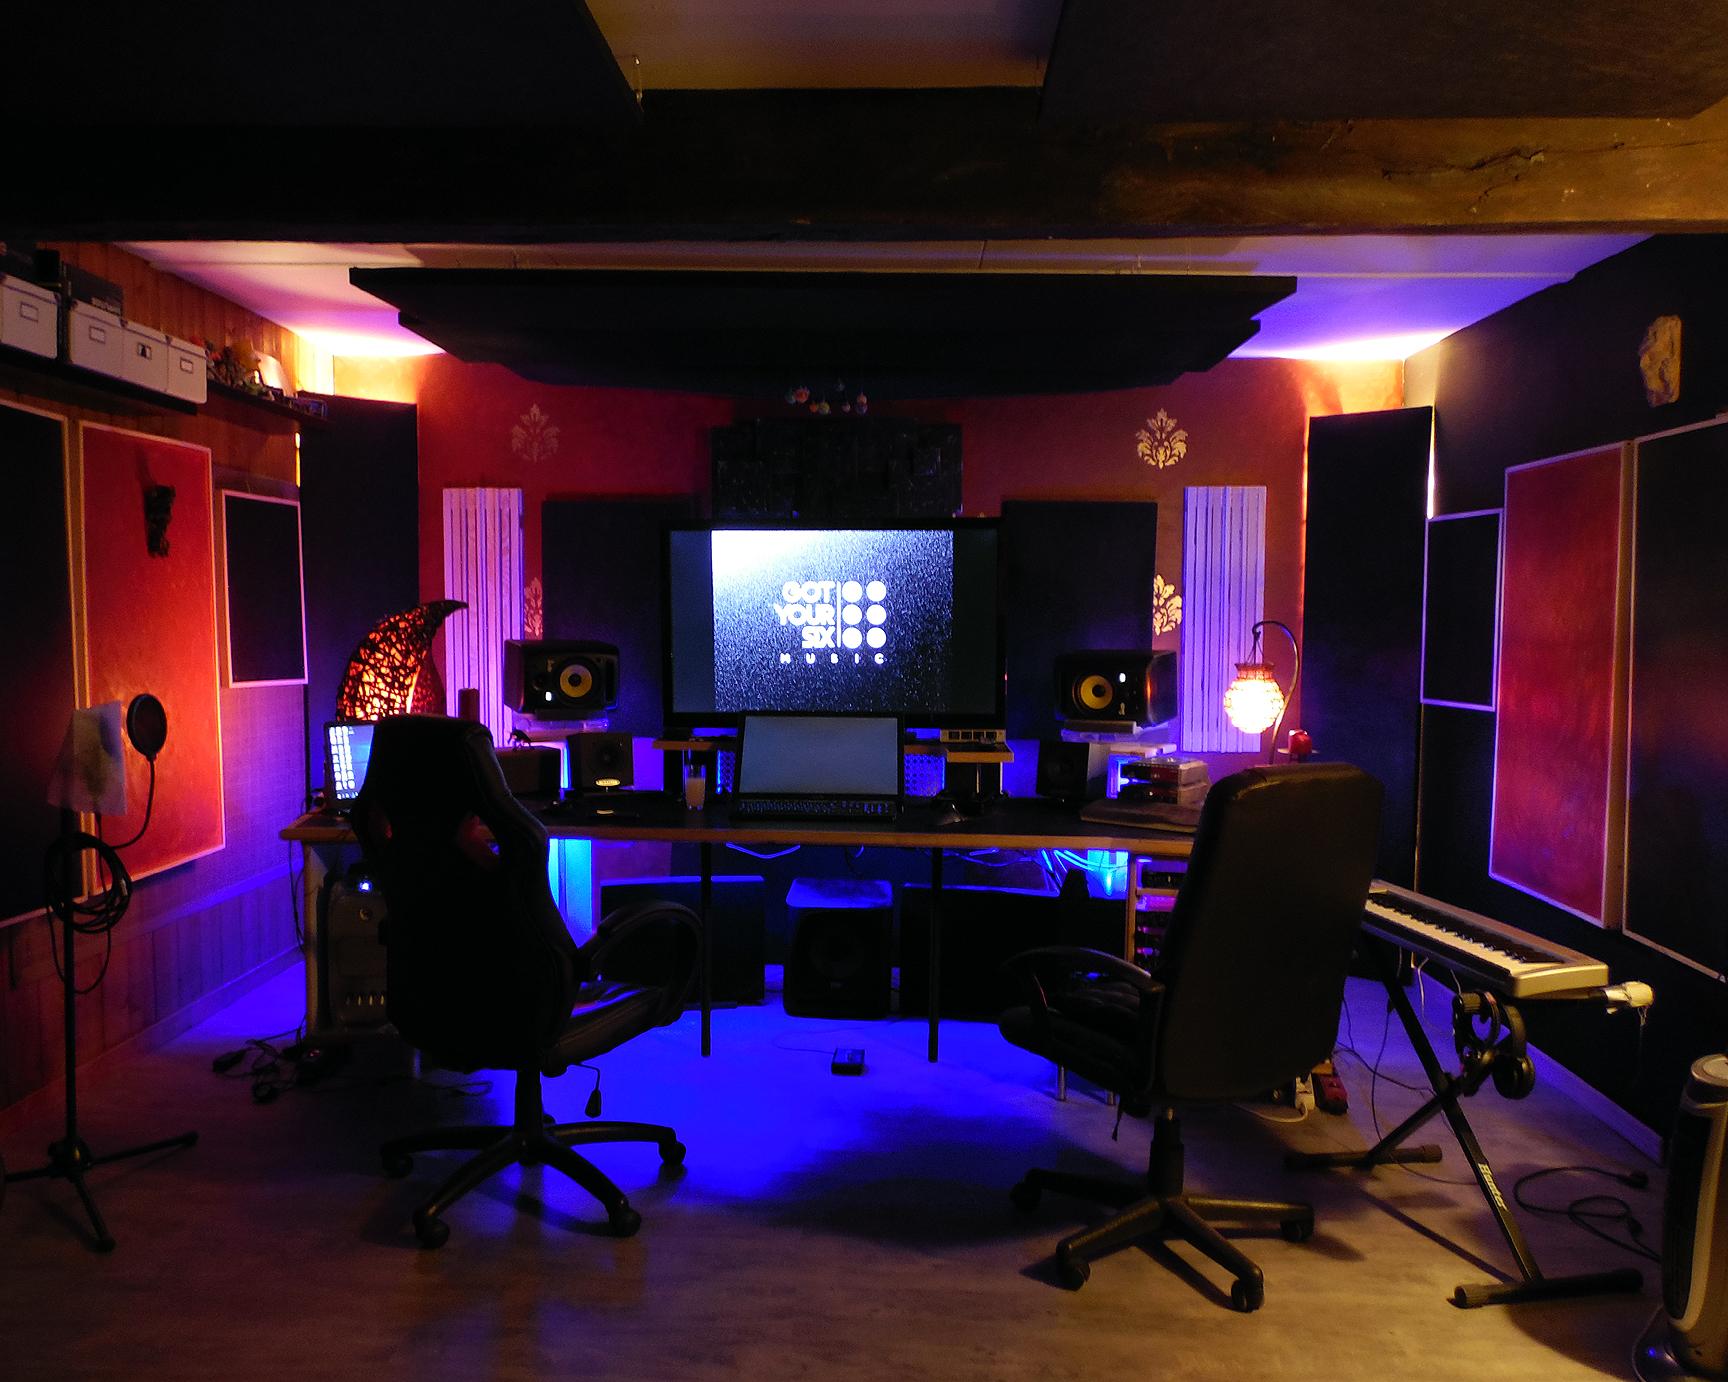 gy6 studio pic 02